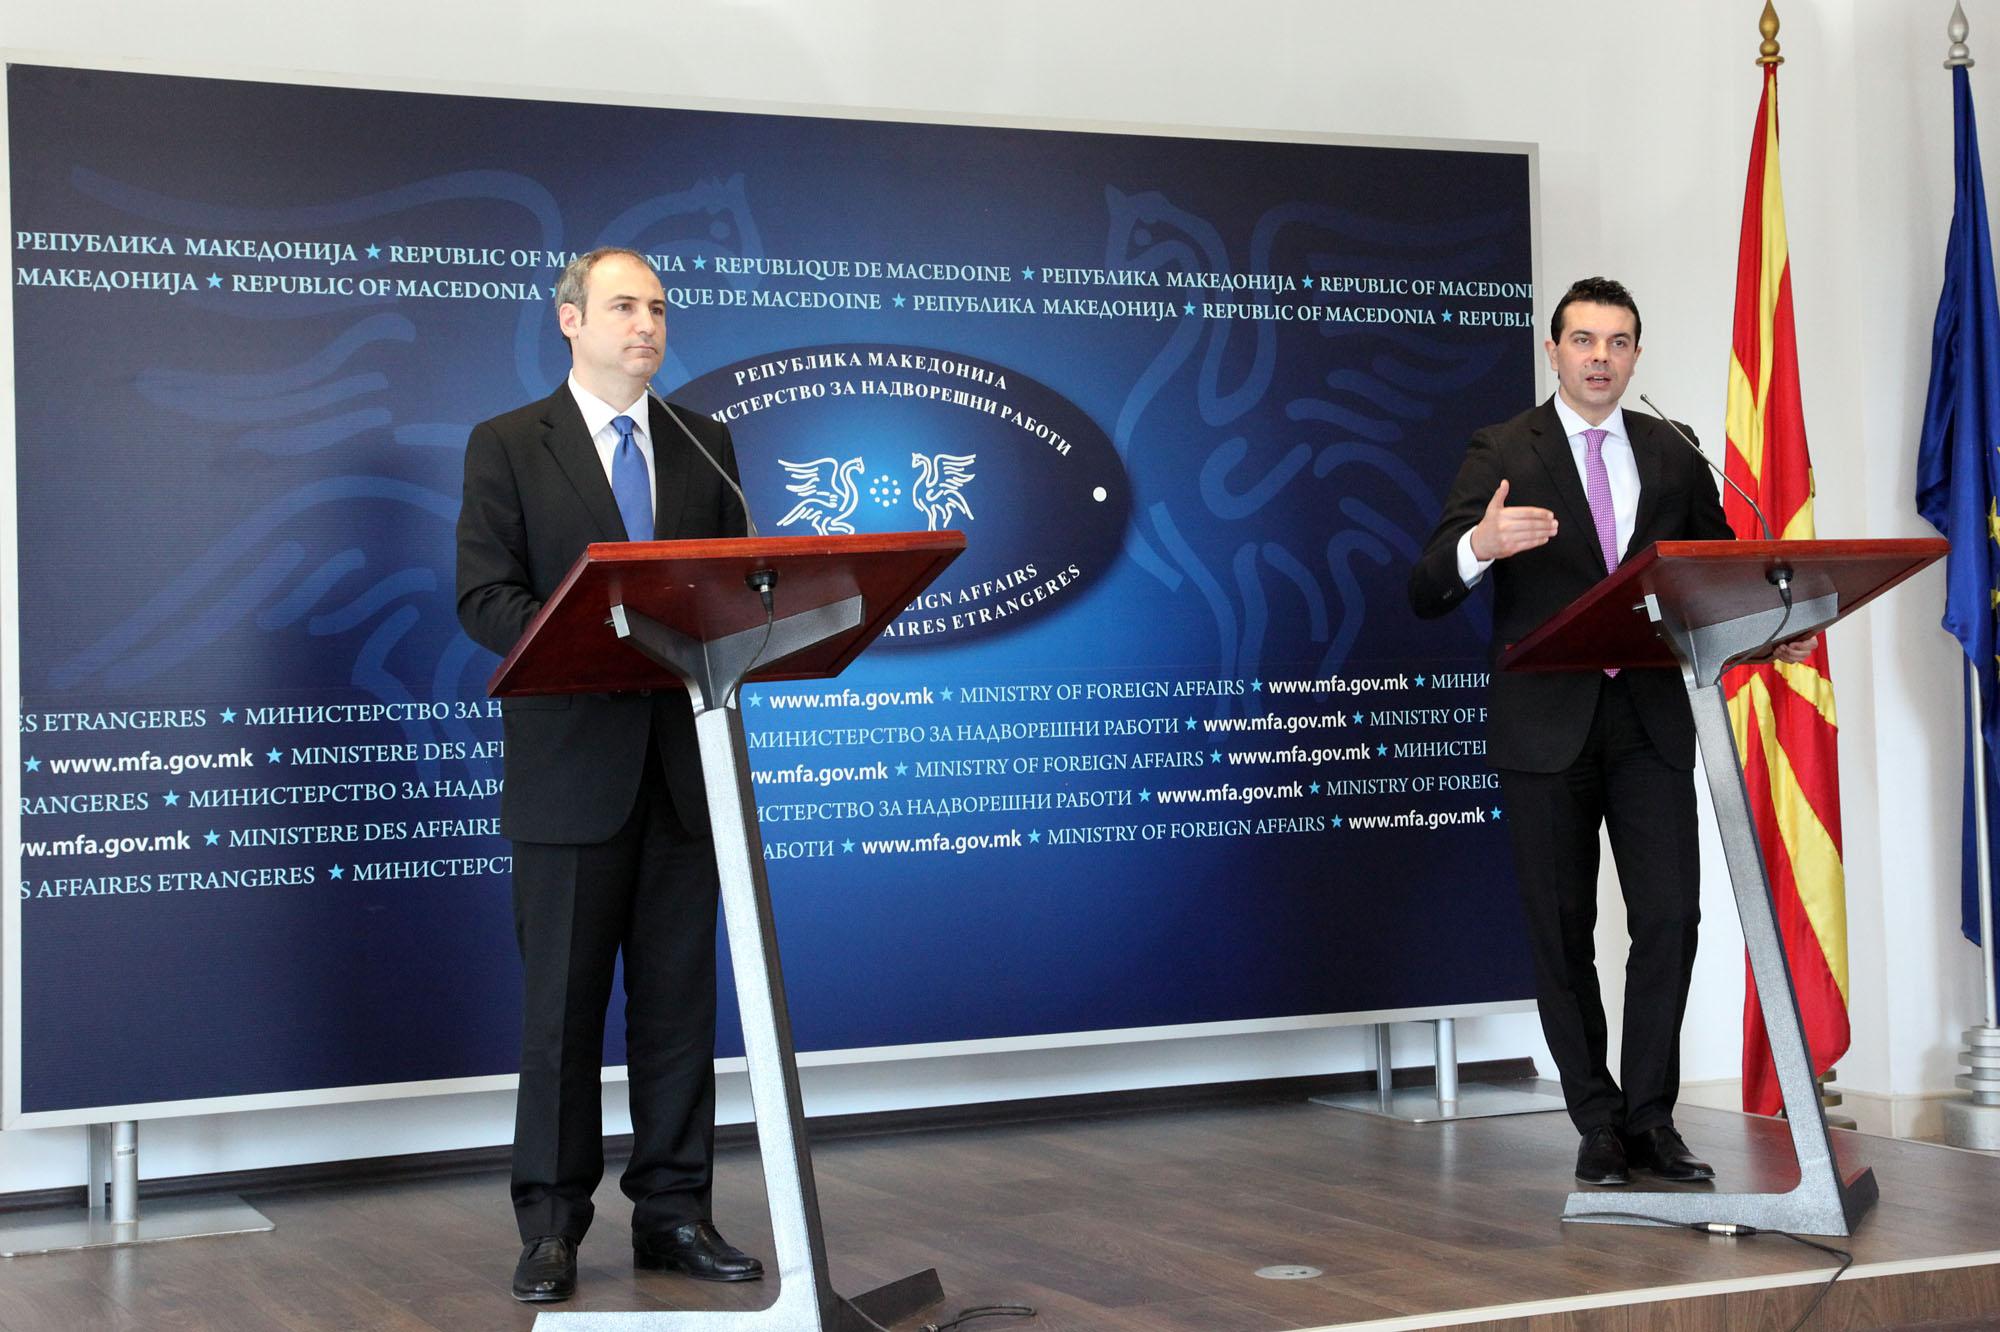 Bumçi-Popovski: Albania has been consistent toward FYRO Macedonia